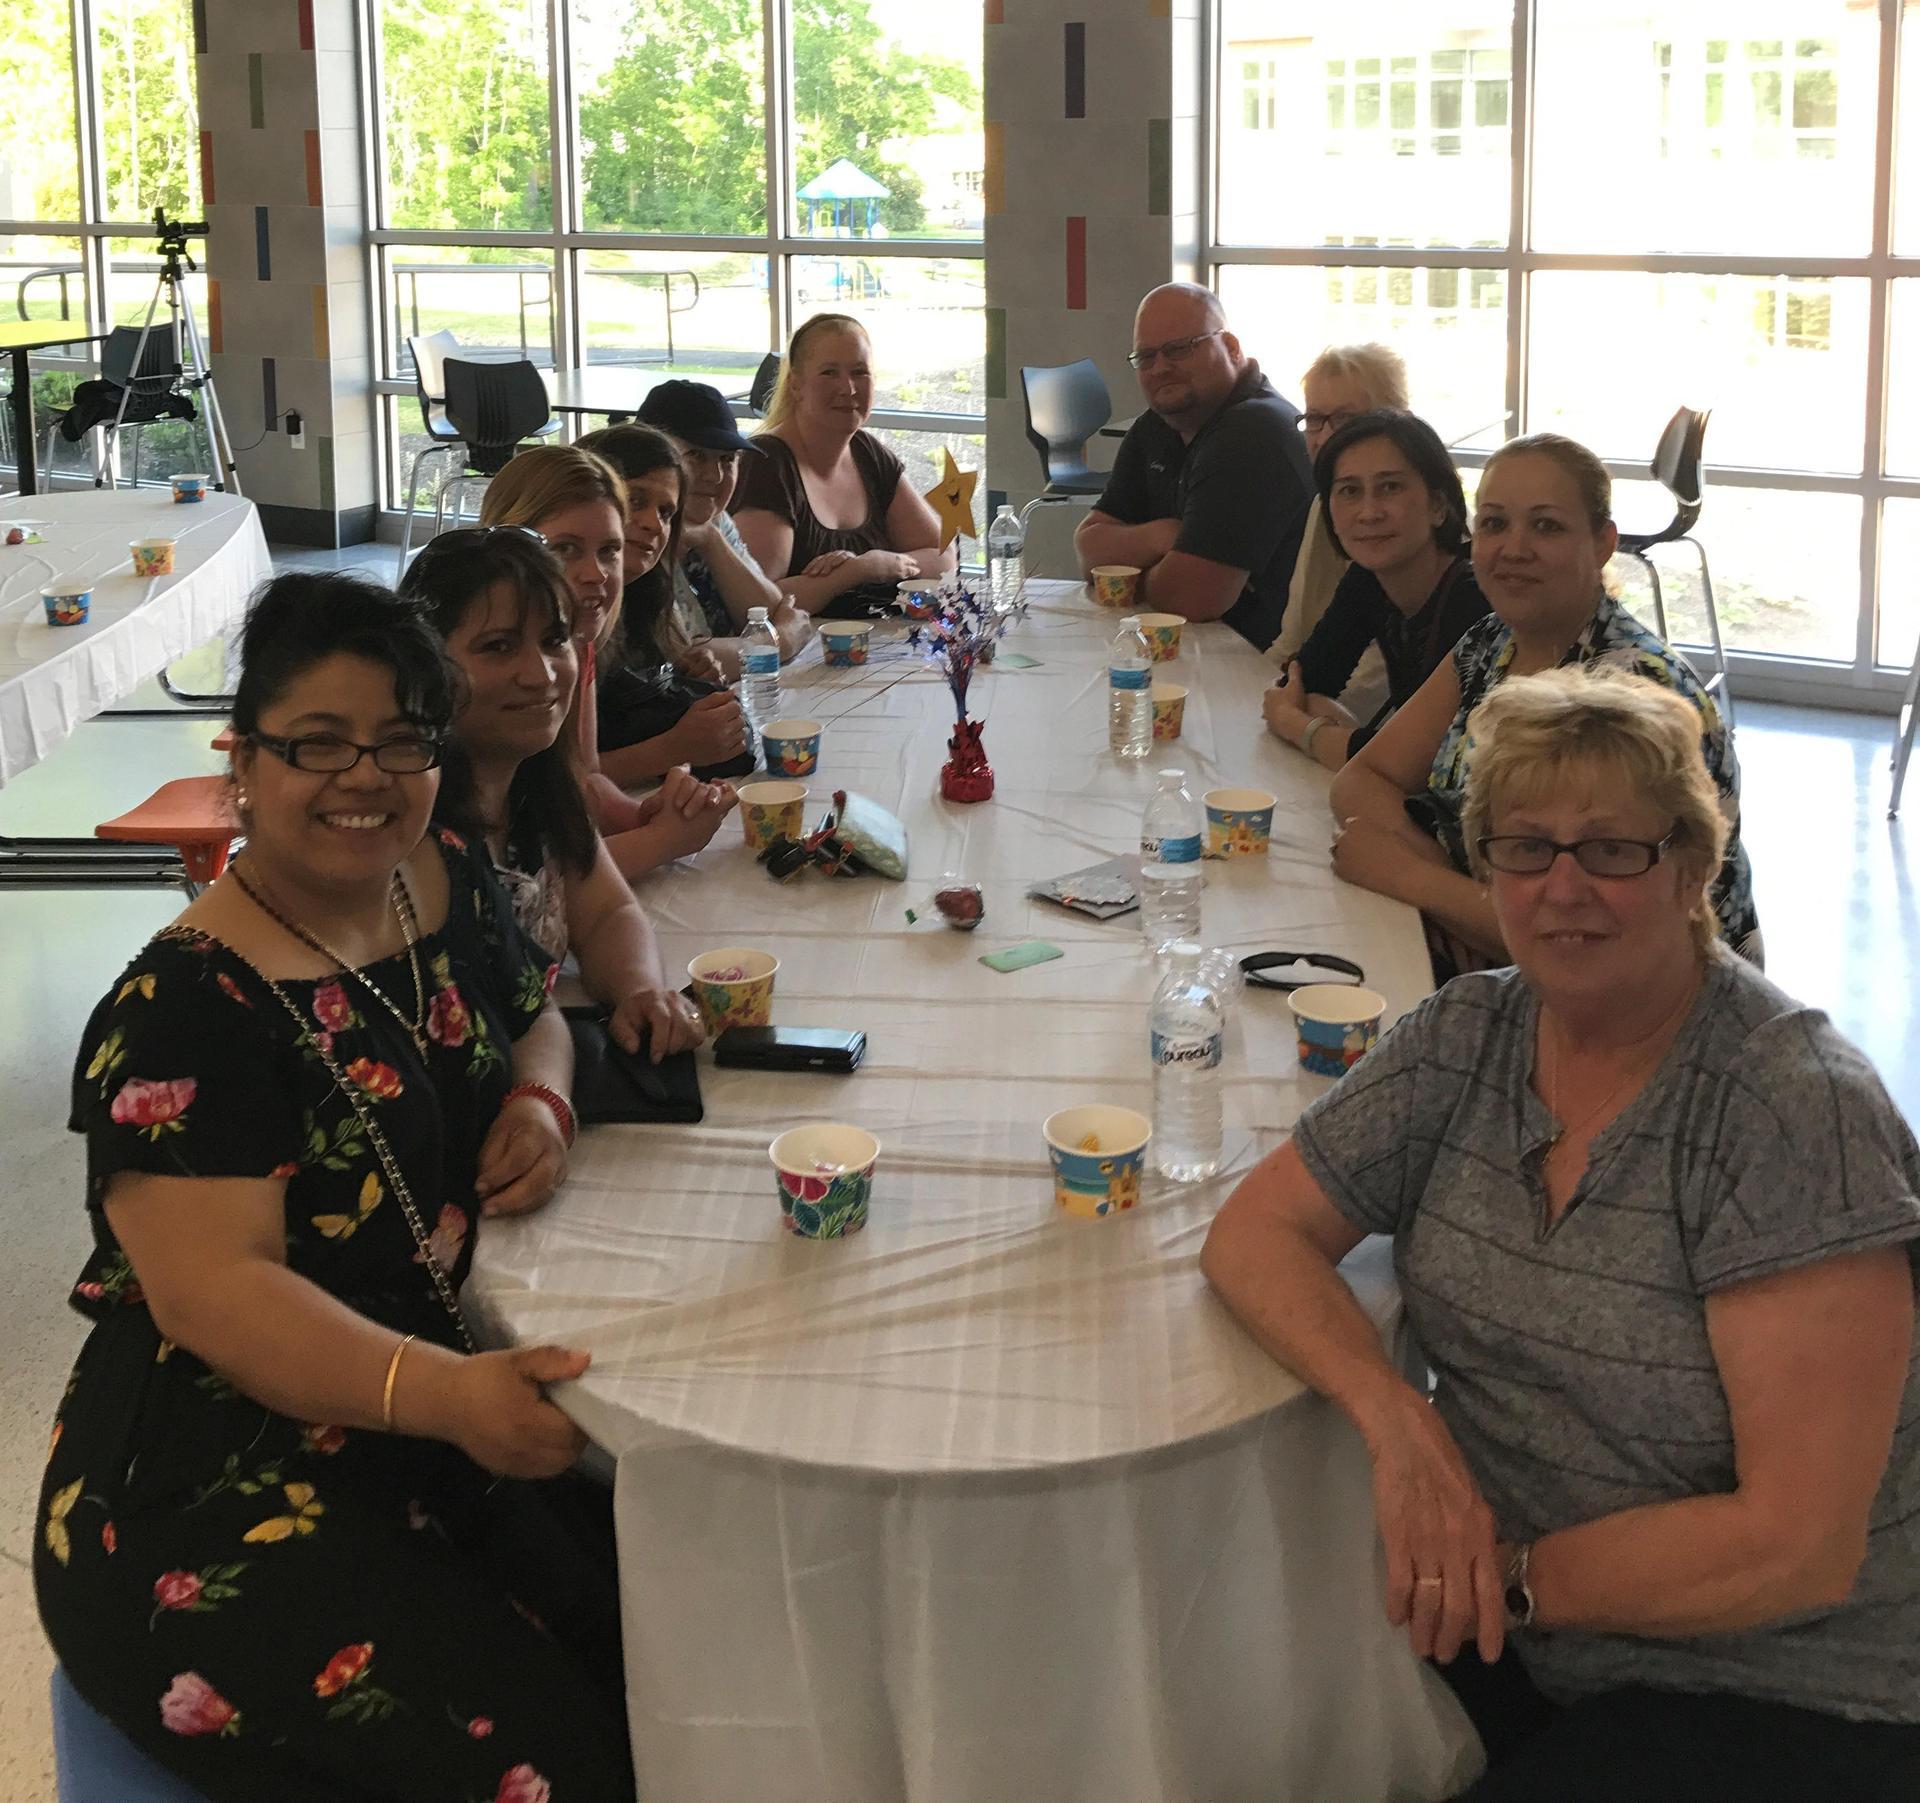 Professional Development at Hatboro Horsham School District with the School Nutrition Association